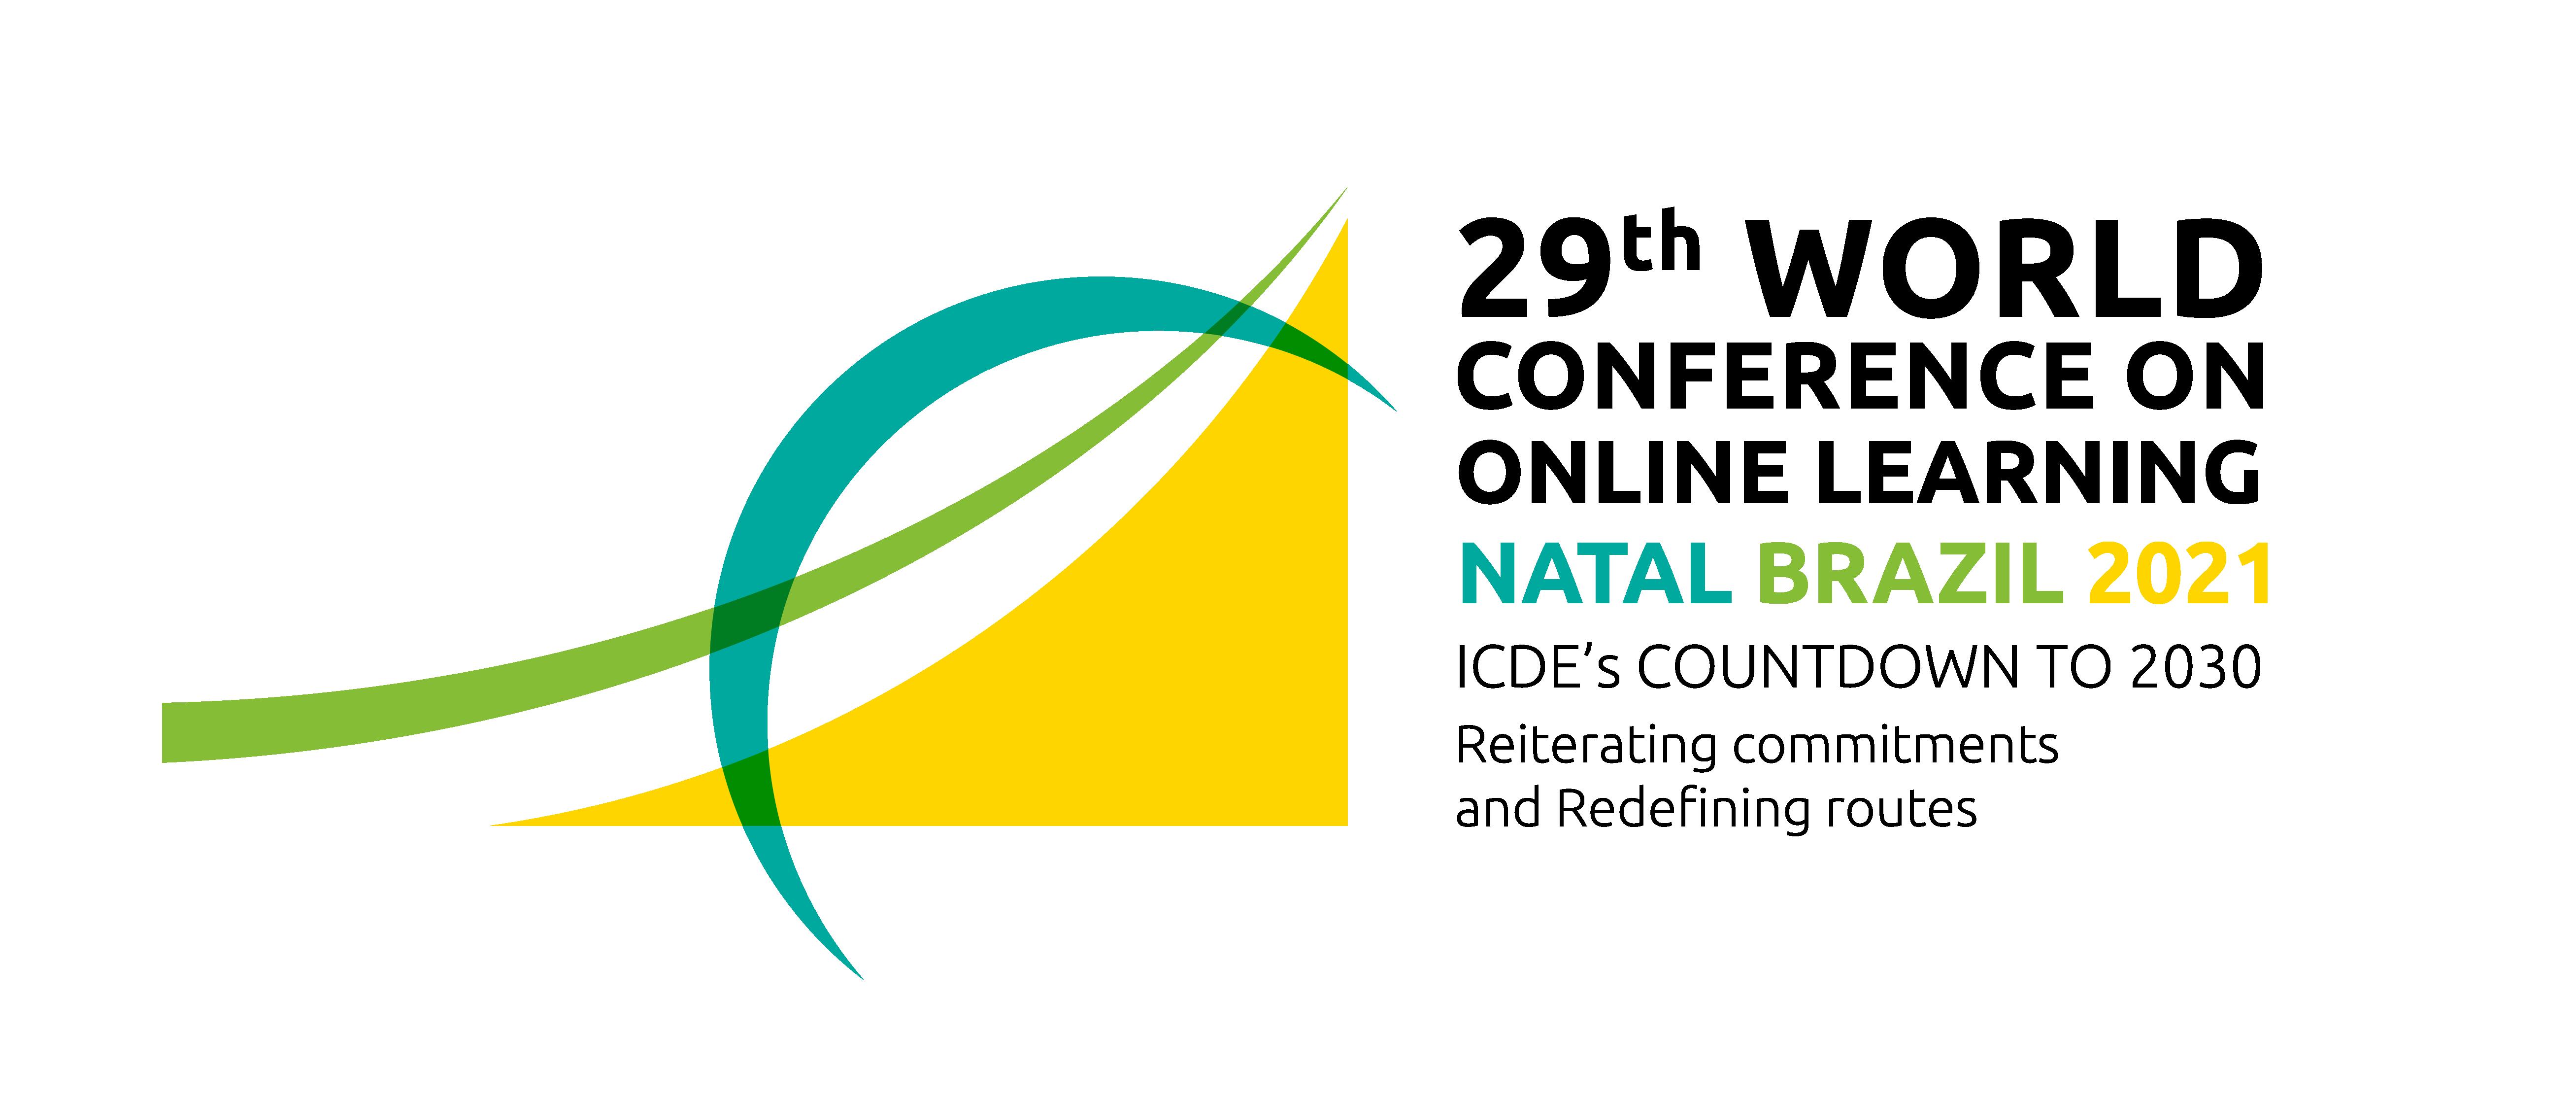 ICDE WCOL21 NATAL, BRAZIL 18-21 oktober 2021